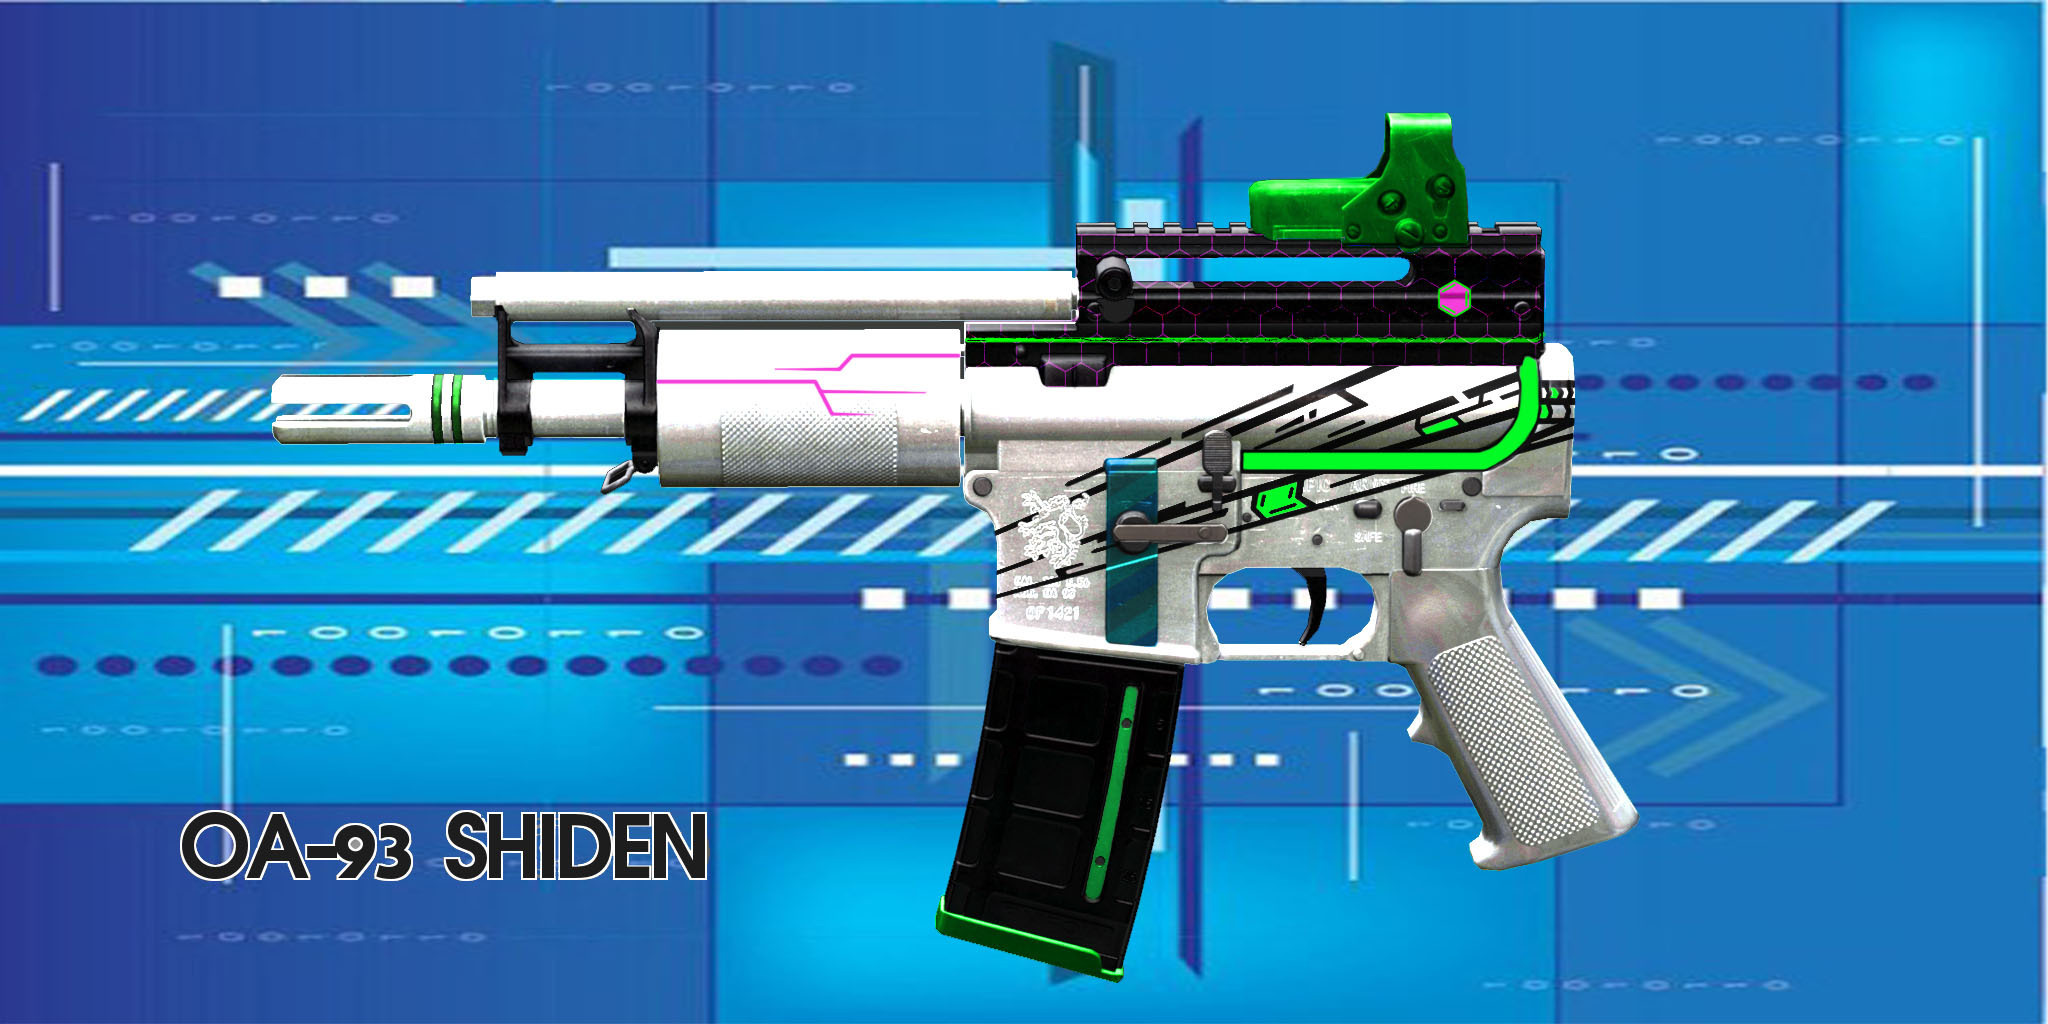 OA-93 SHIDEN